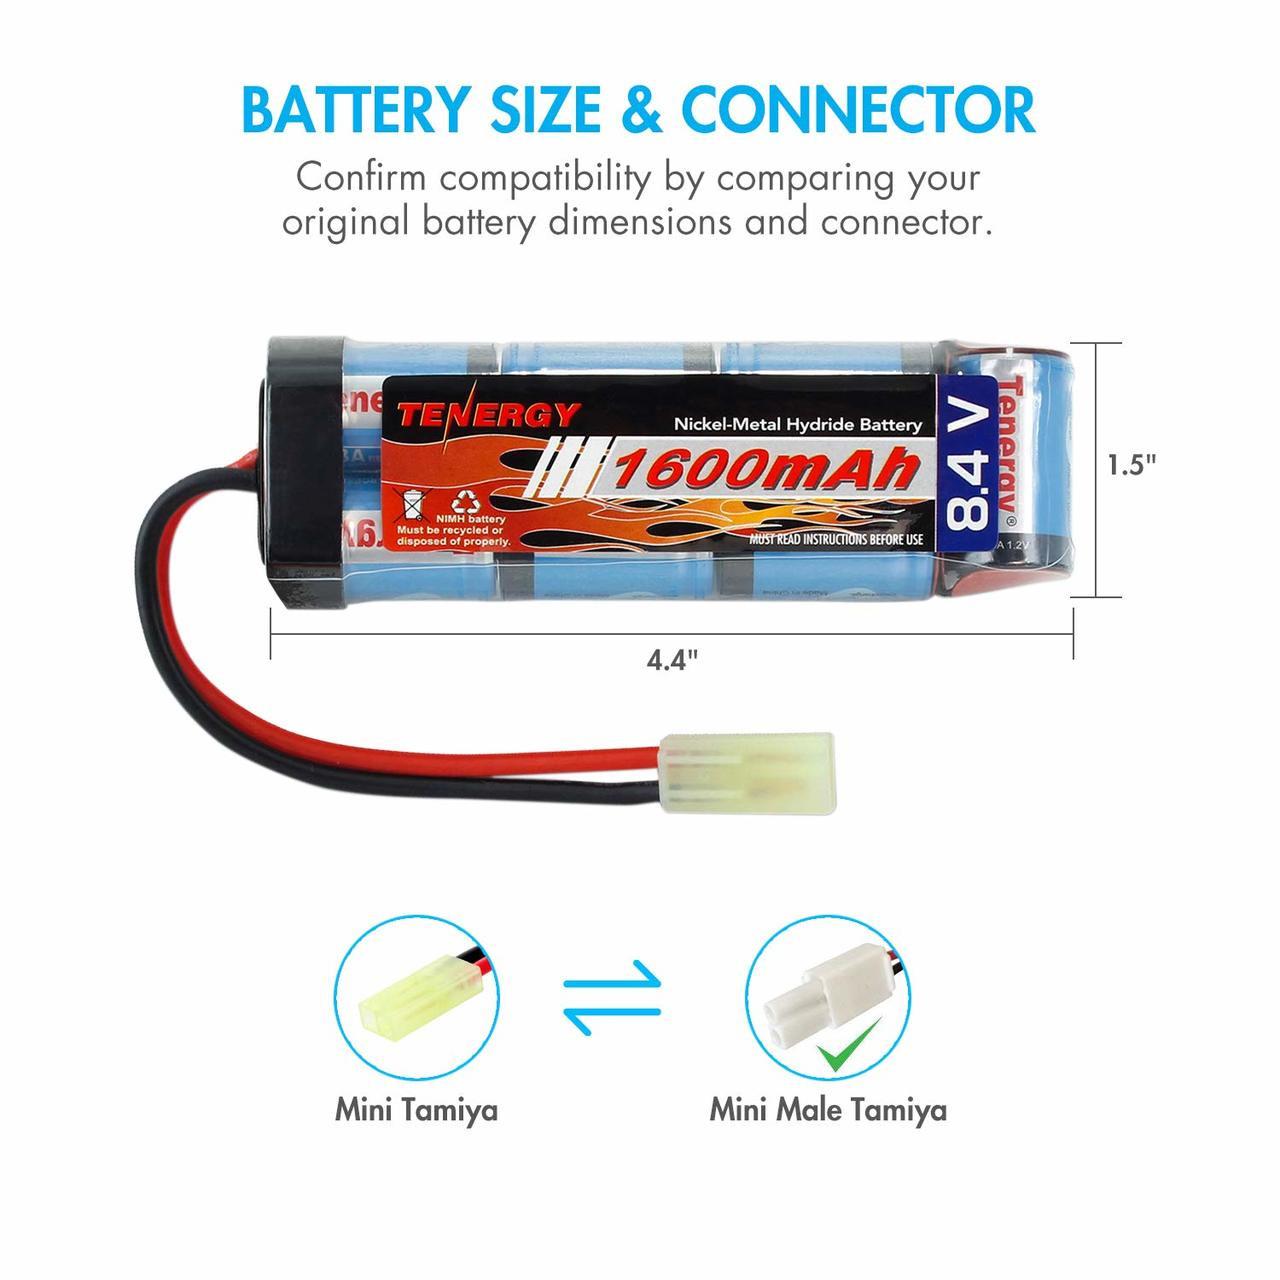 Combo: Tenergy Airsoft NiMH 8.4V 1600mAh Flat Battery Pack /w Mini Tamiya + Charger (#01026)